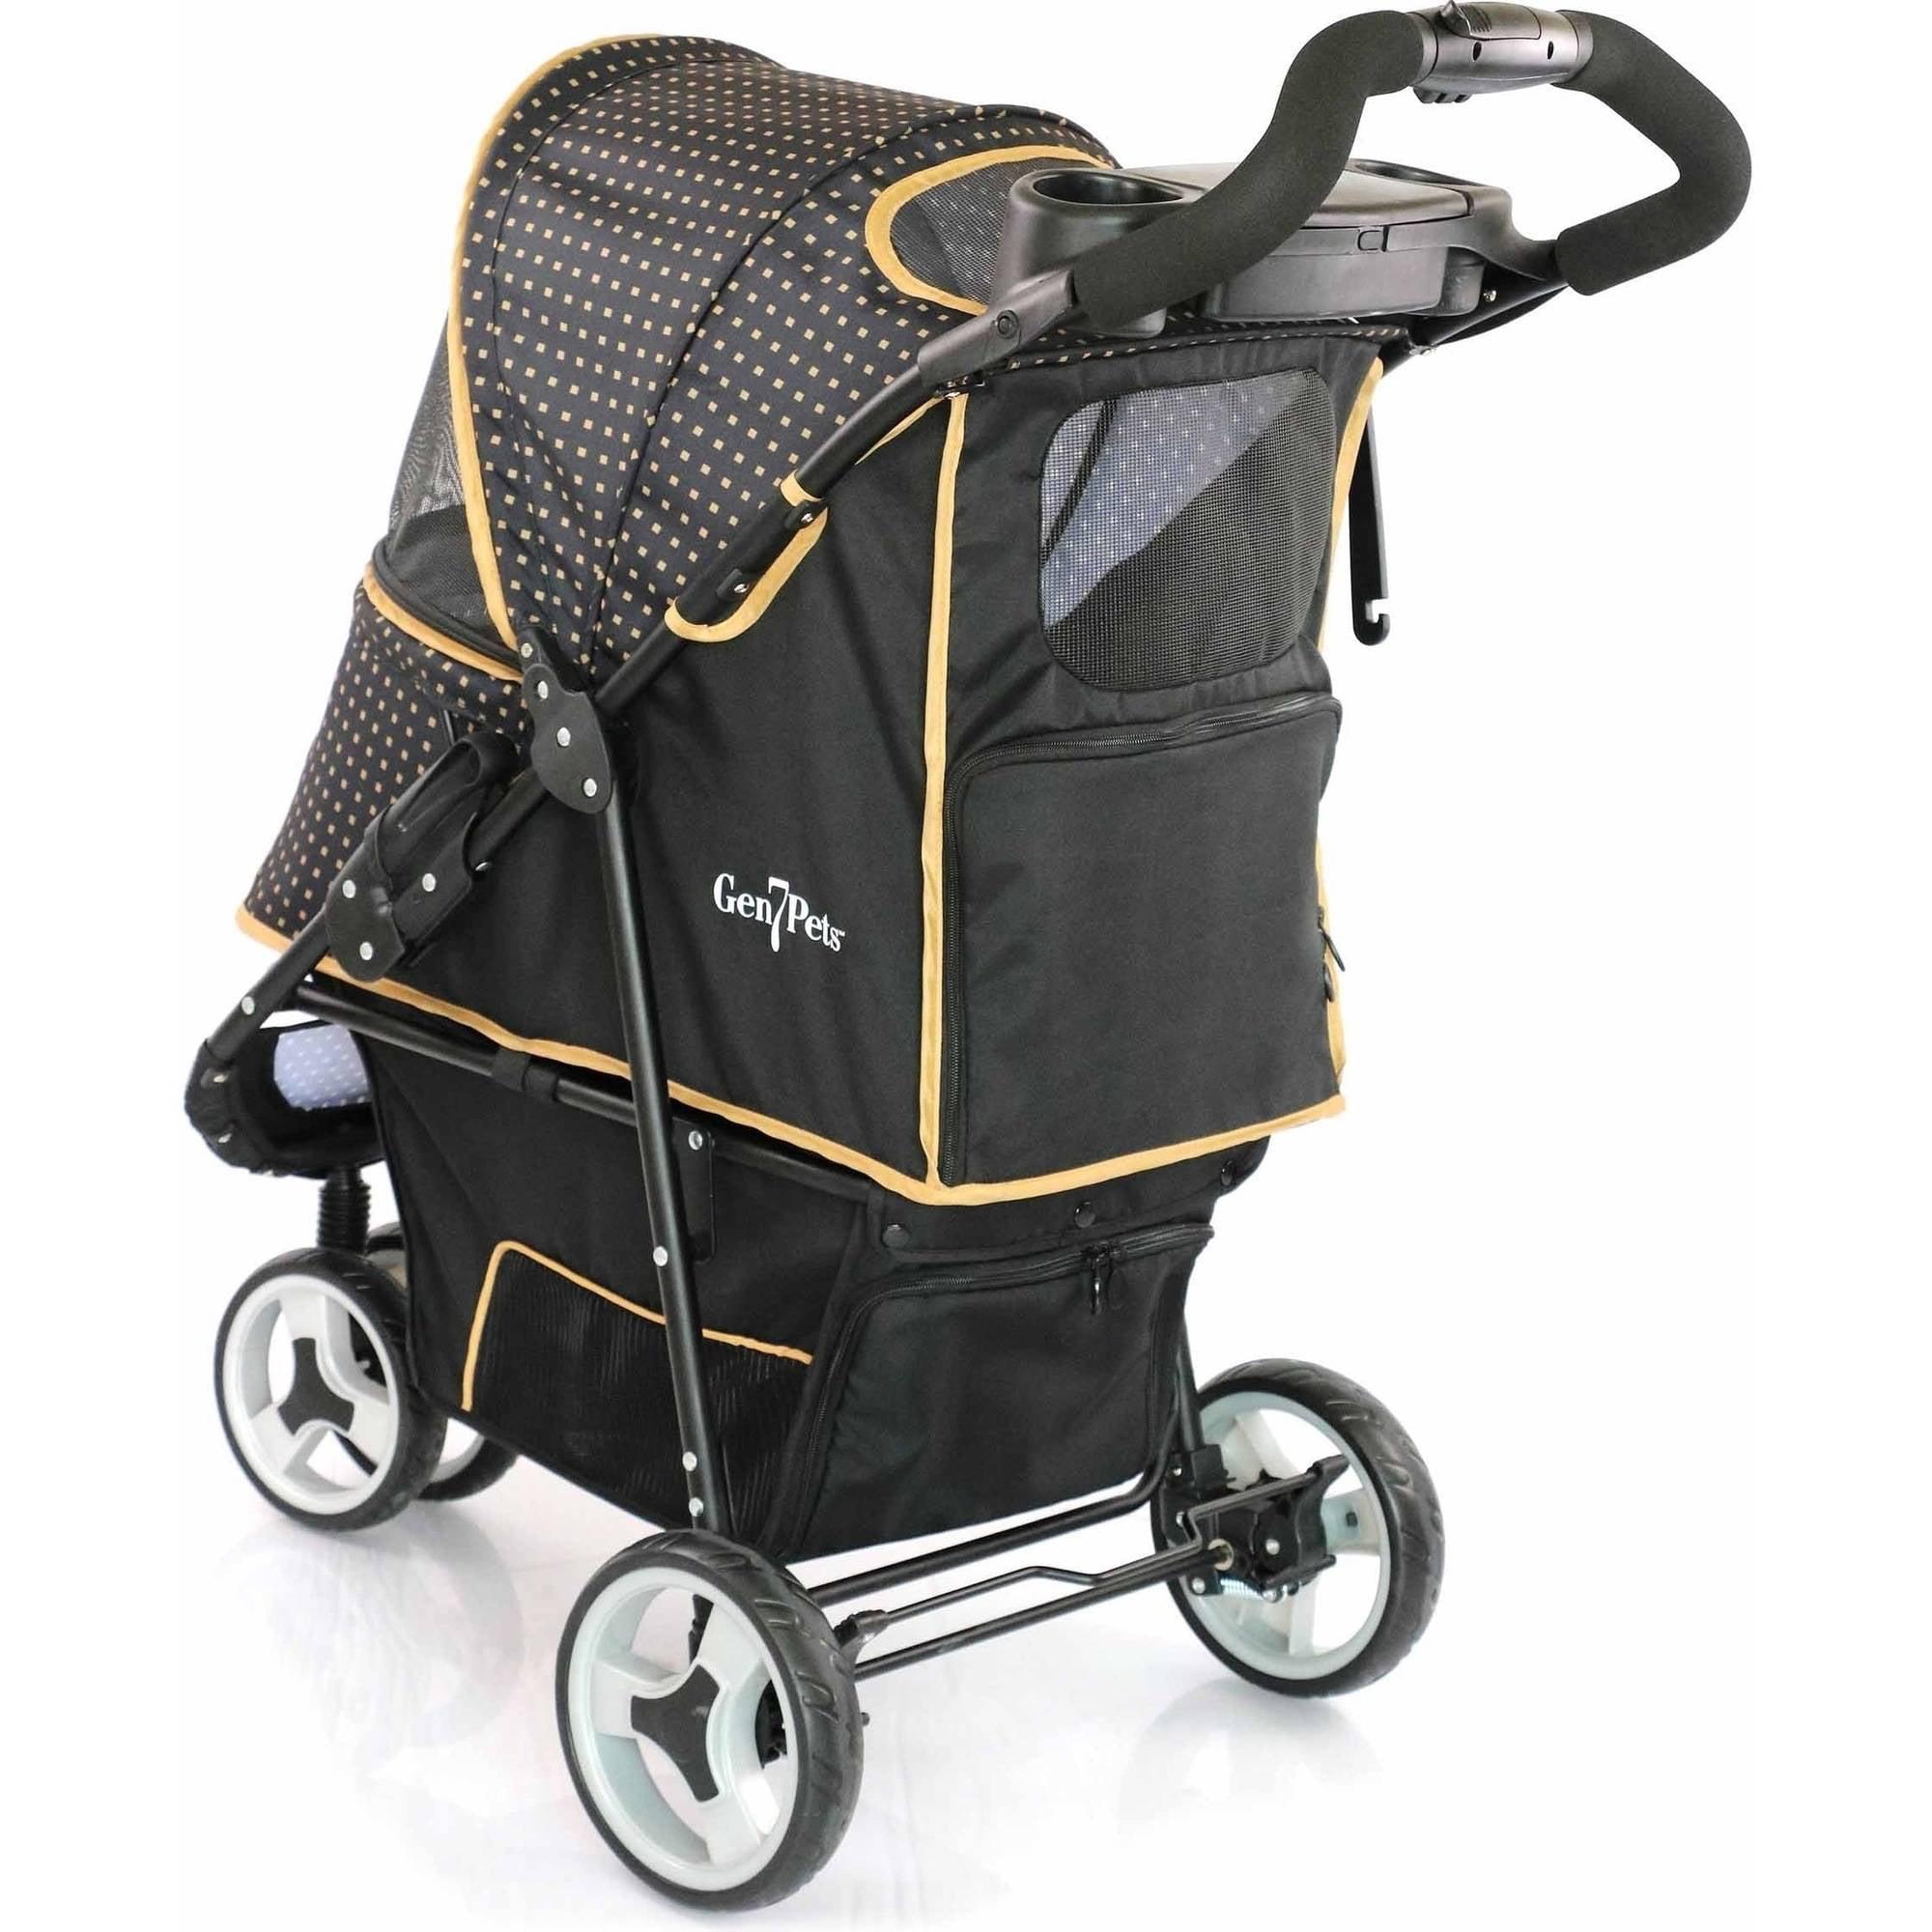 gen 7 promenade pet stroller